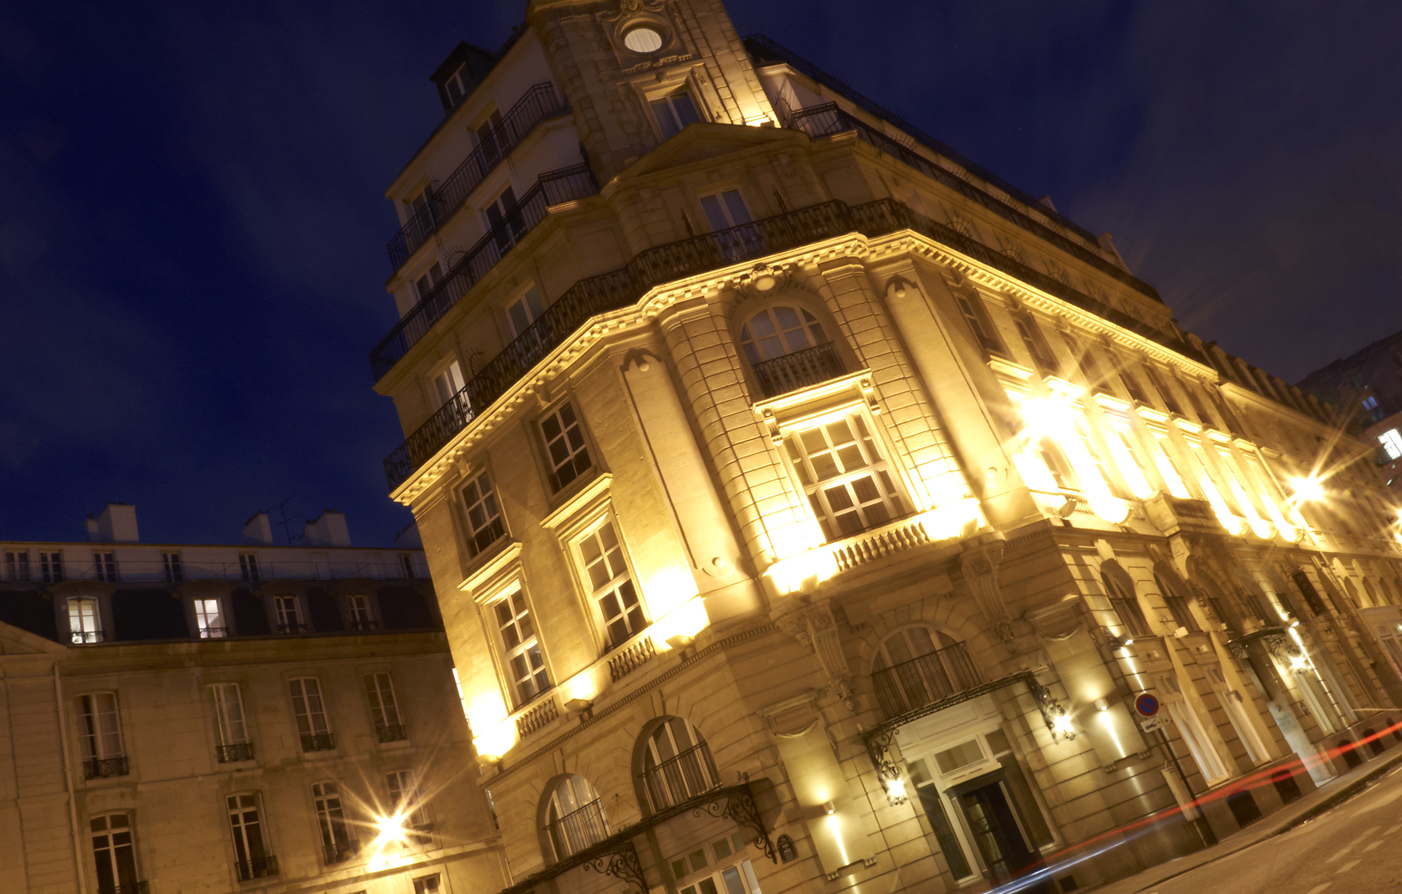 301 moved permanently - Grand hotel palais royal ...